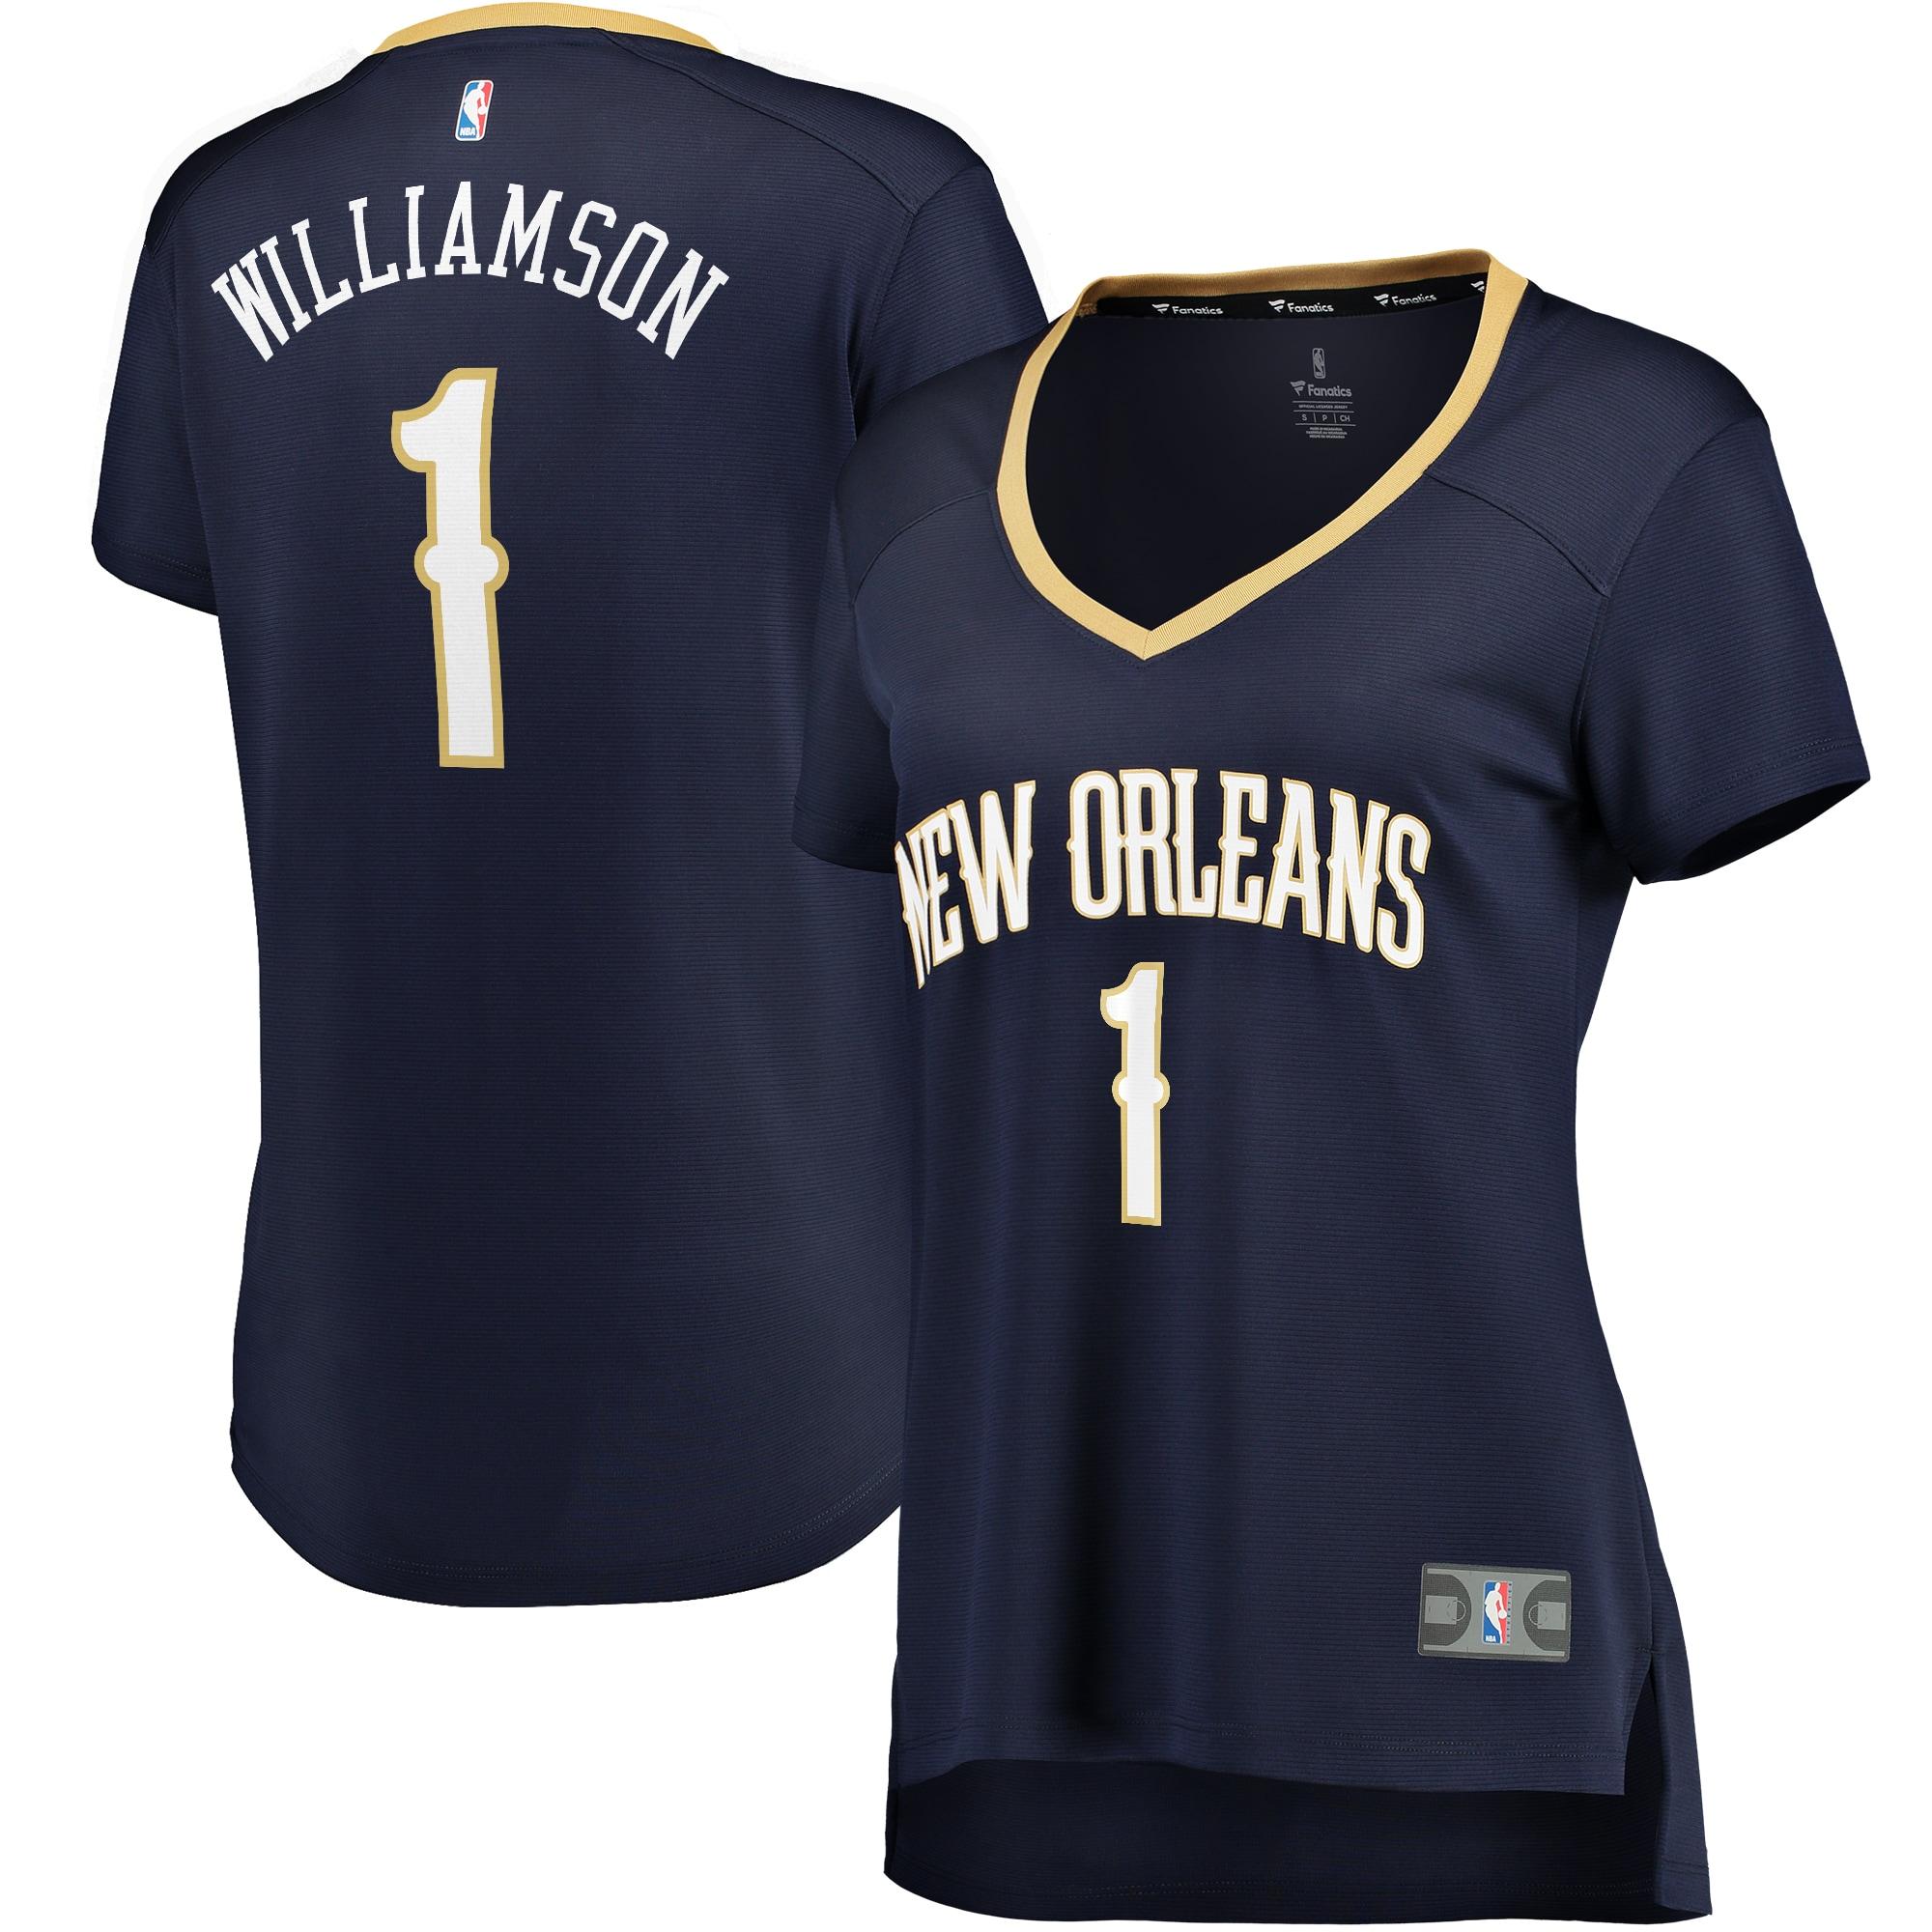 Zion Williamson New Orleans Pelicans Fanatics Branded Women's Fast Break Replica Jersey - Icon Edition - Navy